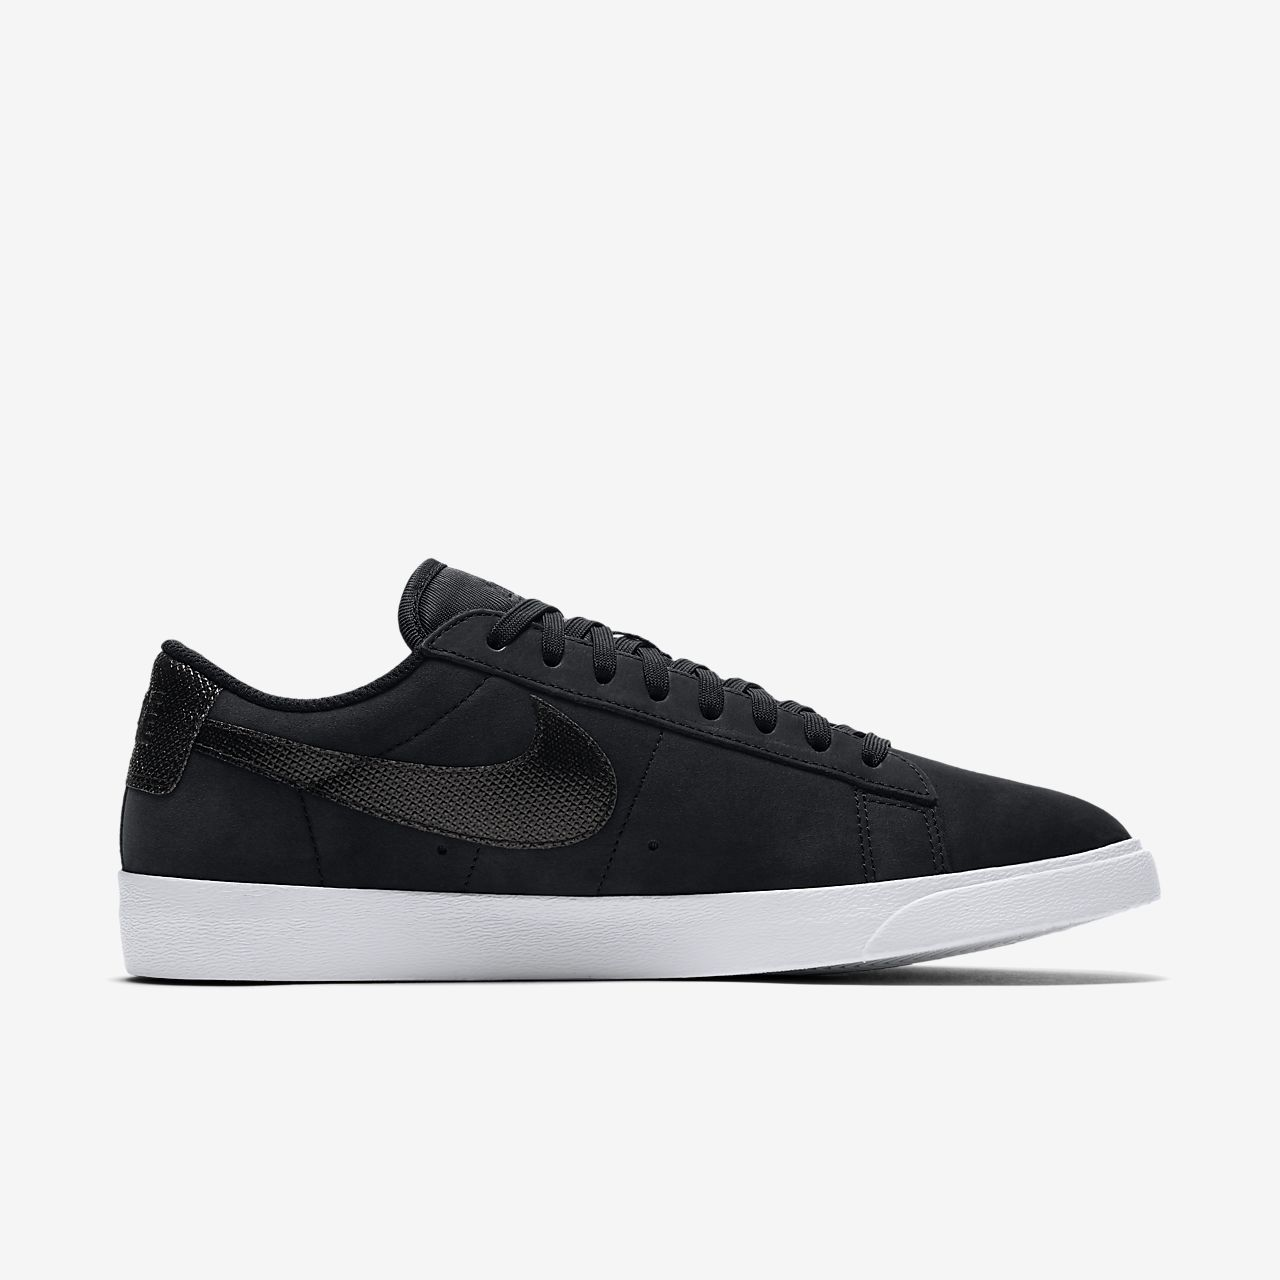 Nike Blazer Sneaker Schoenen Ee Faible Lo vYtV2